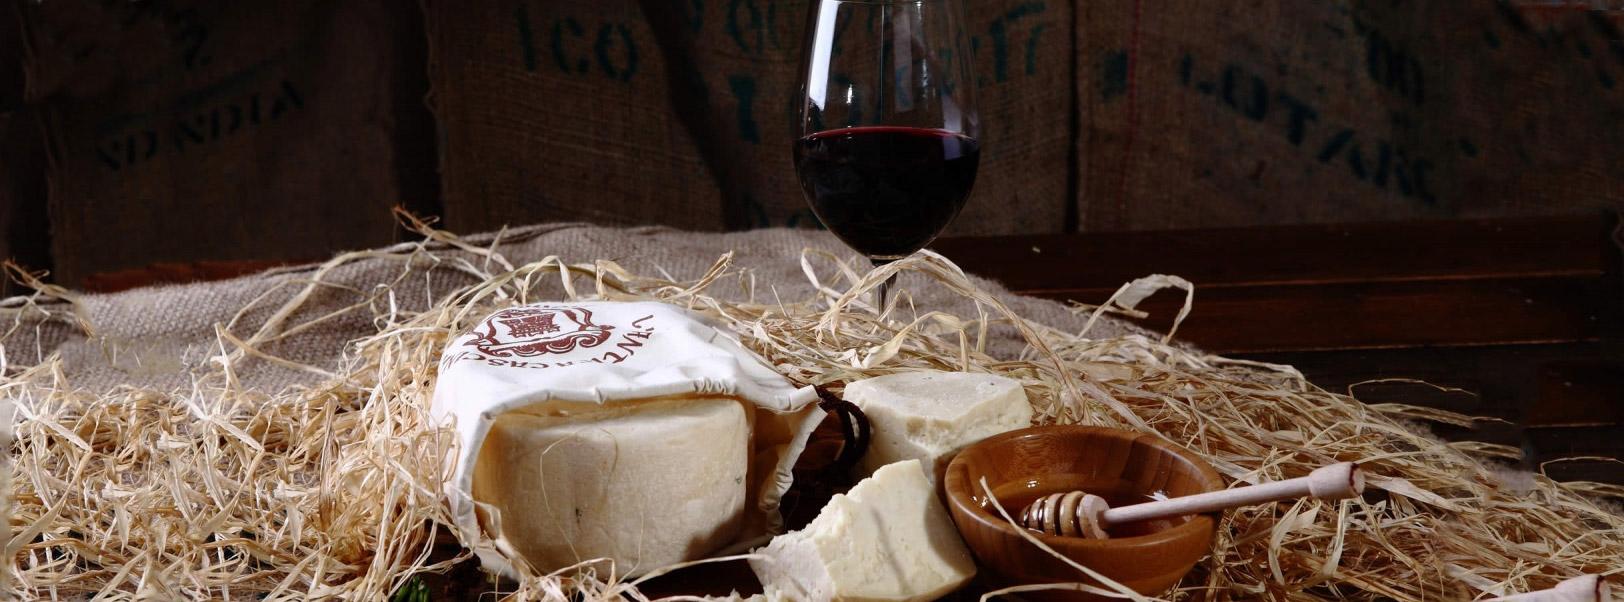 Health and Gastronomy in Emilia-Romagna